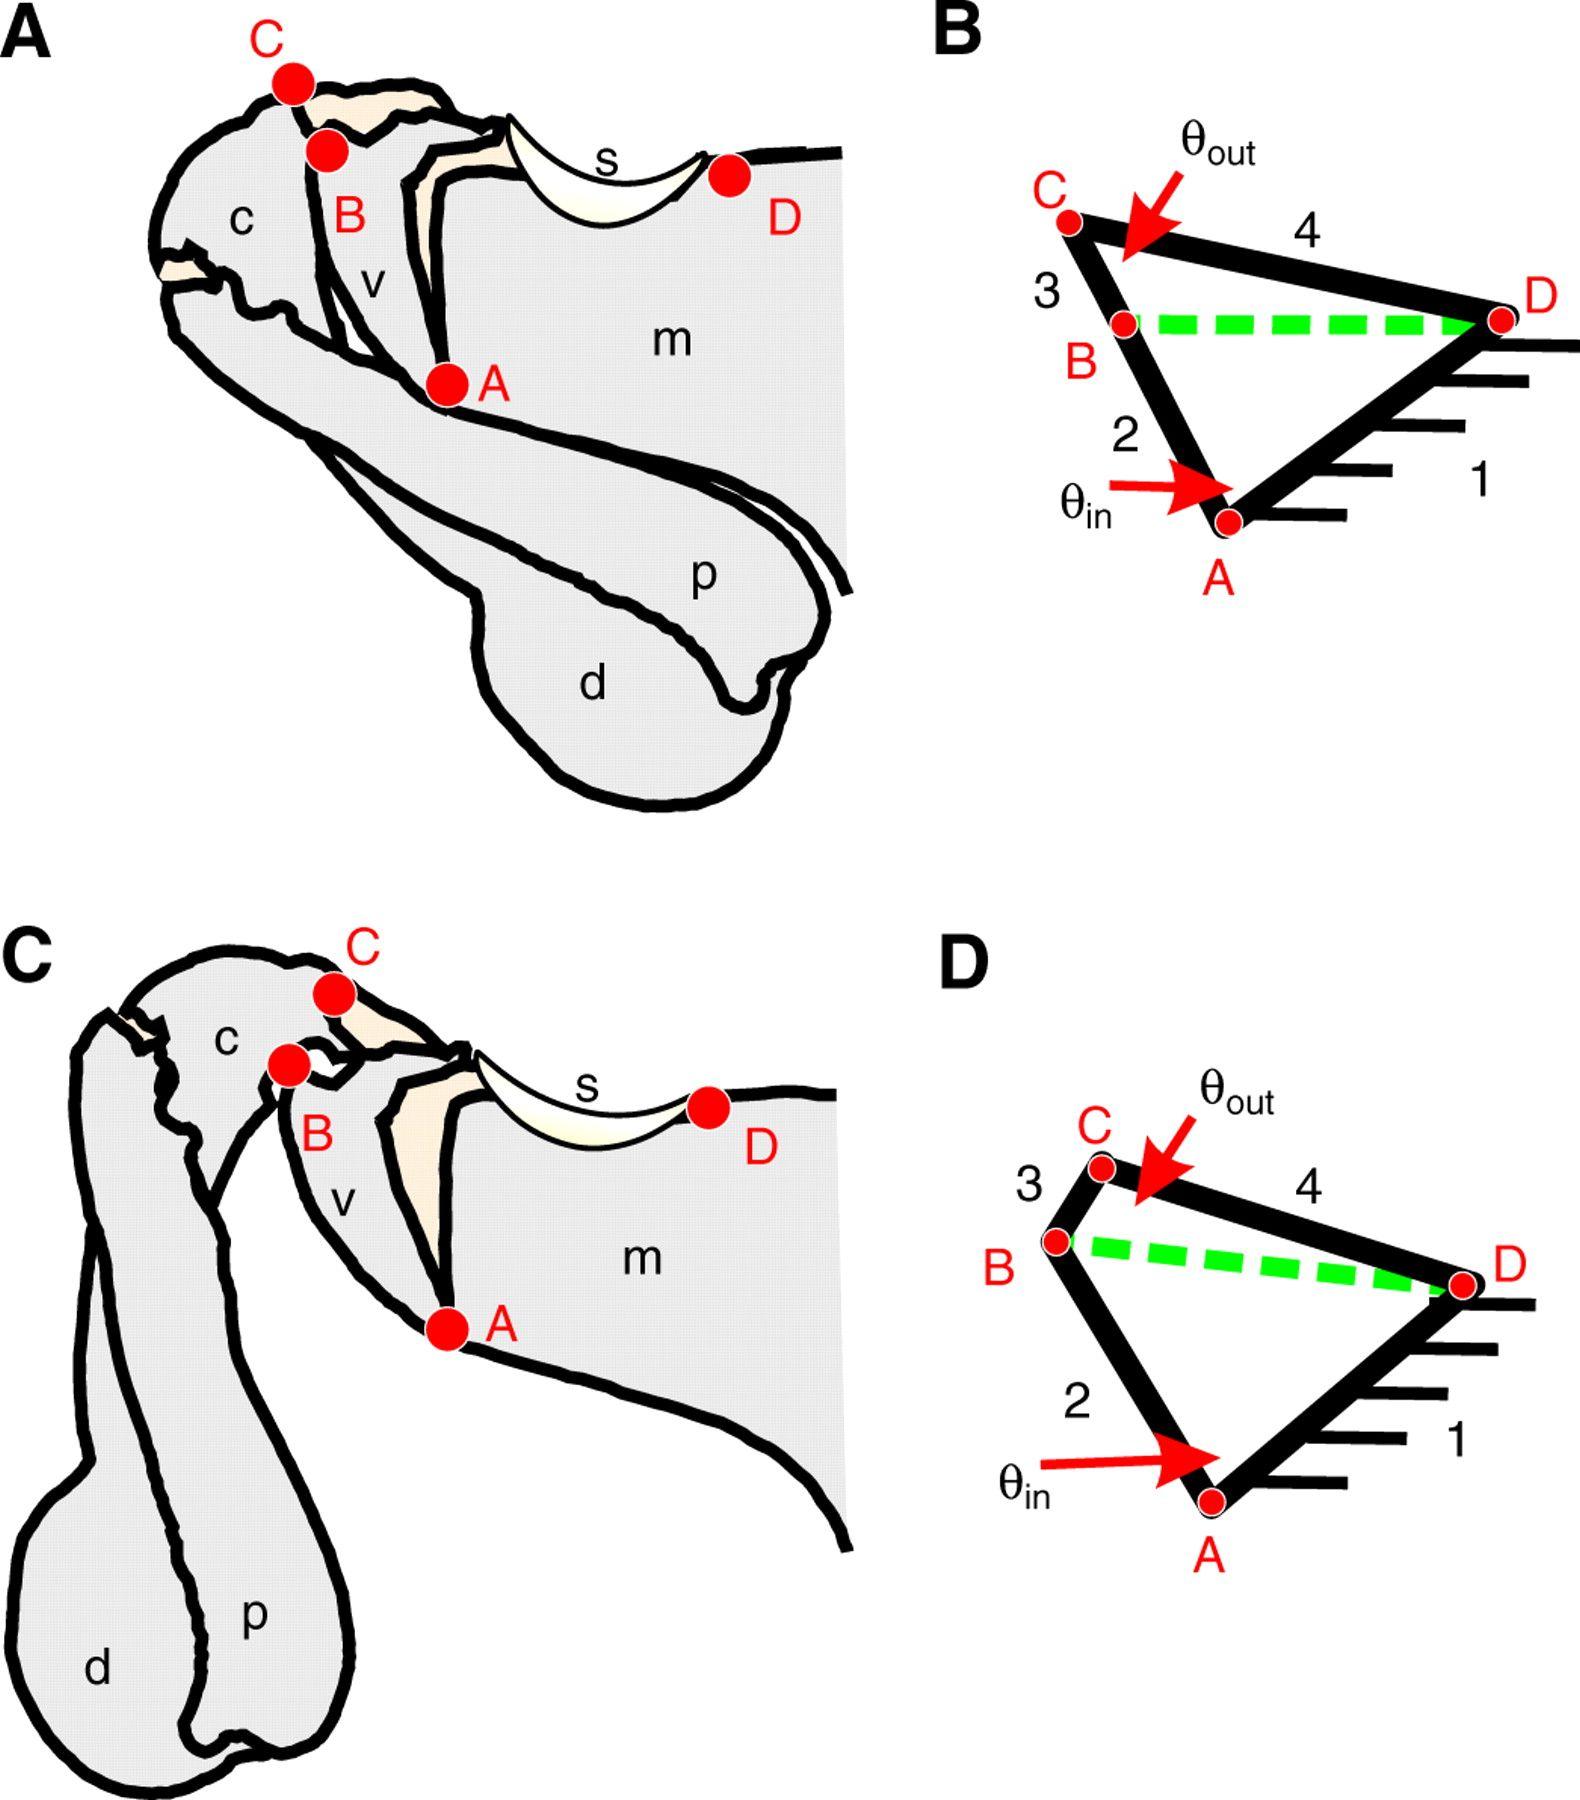 Pin By Mike Rotz On Mantis Shrimp Mantis Shrimp Systems Biology